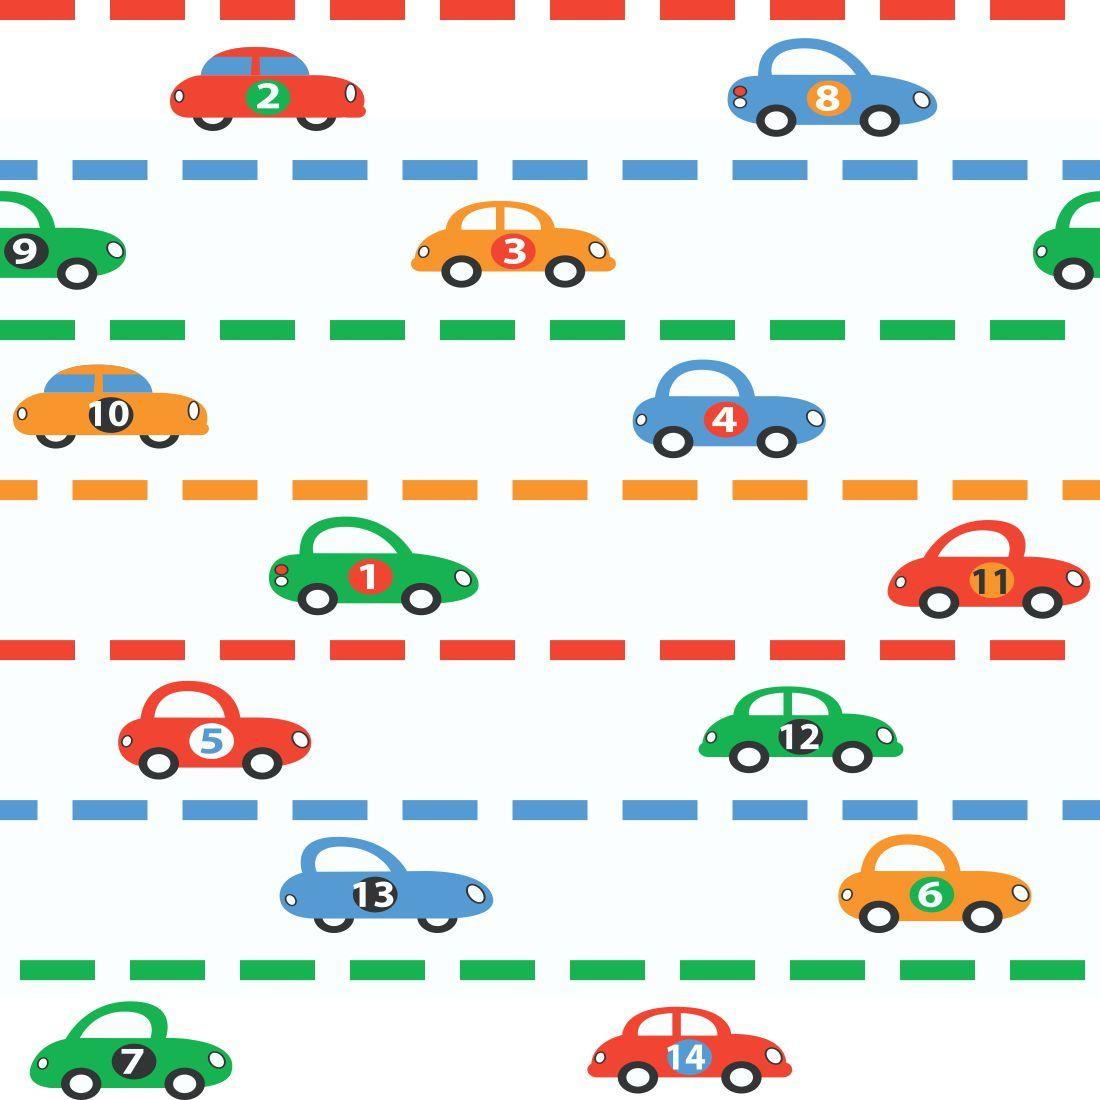 Papel de parede carros decor 65 no elo7 crie decore 5ae91f for Papel vinilico infantil